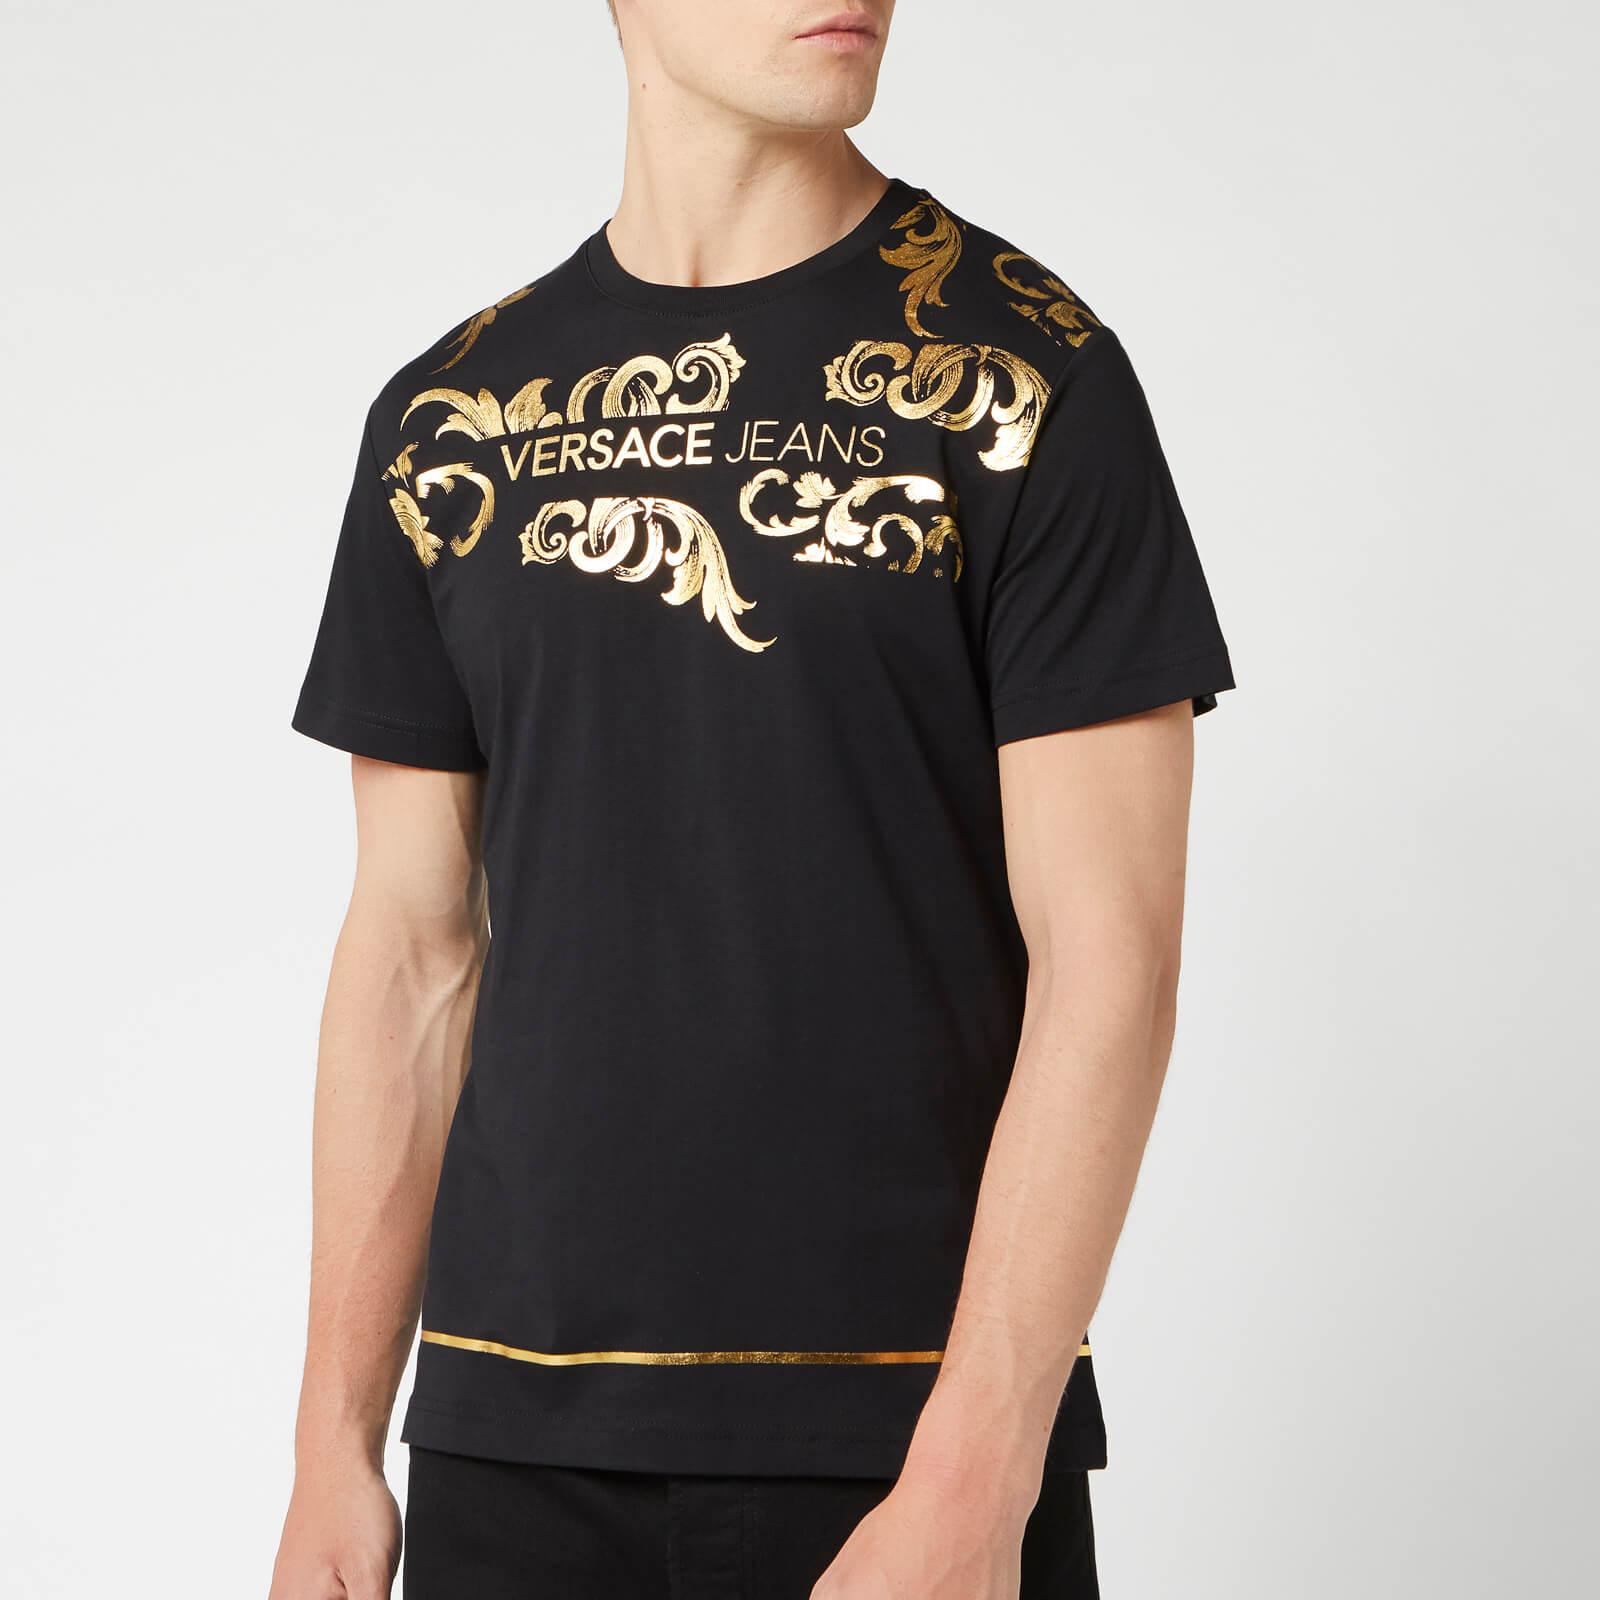 Versace Jeans Men's Collar Print T-Shirt - Black - XXL - Black